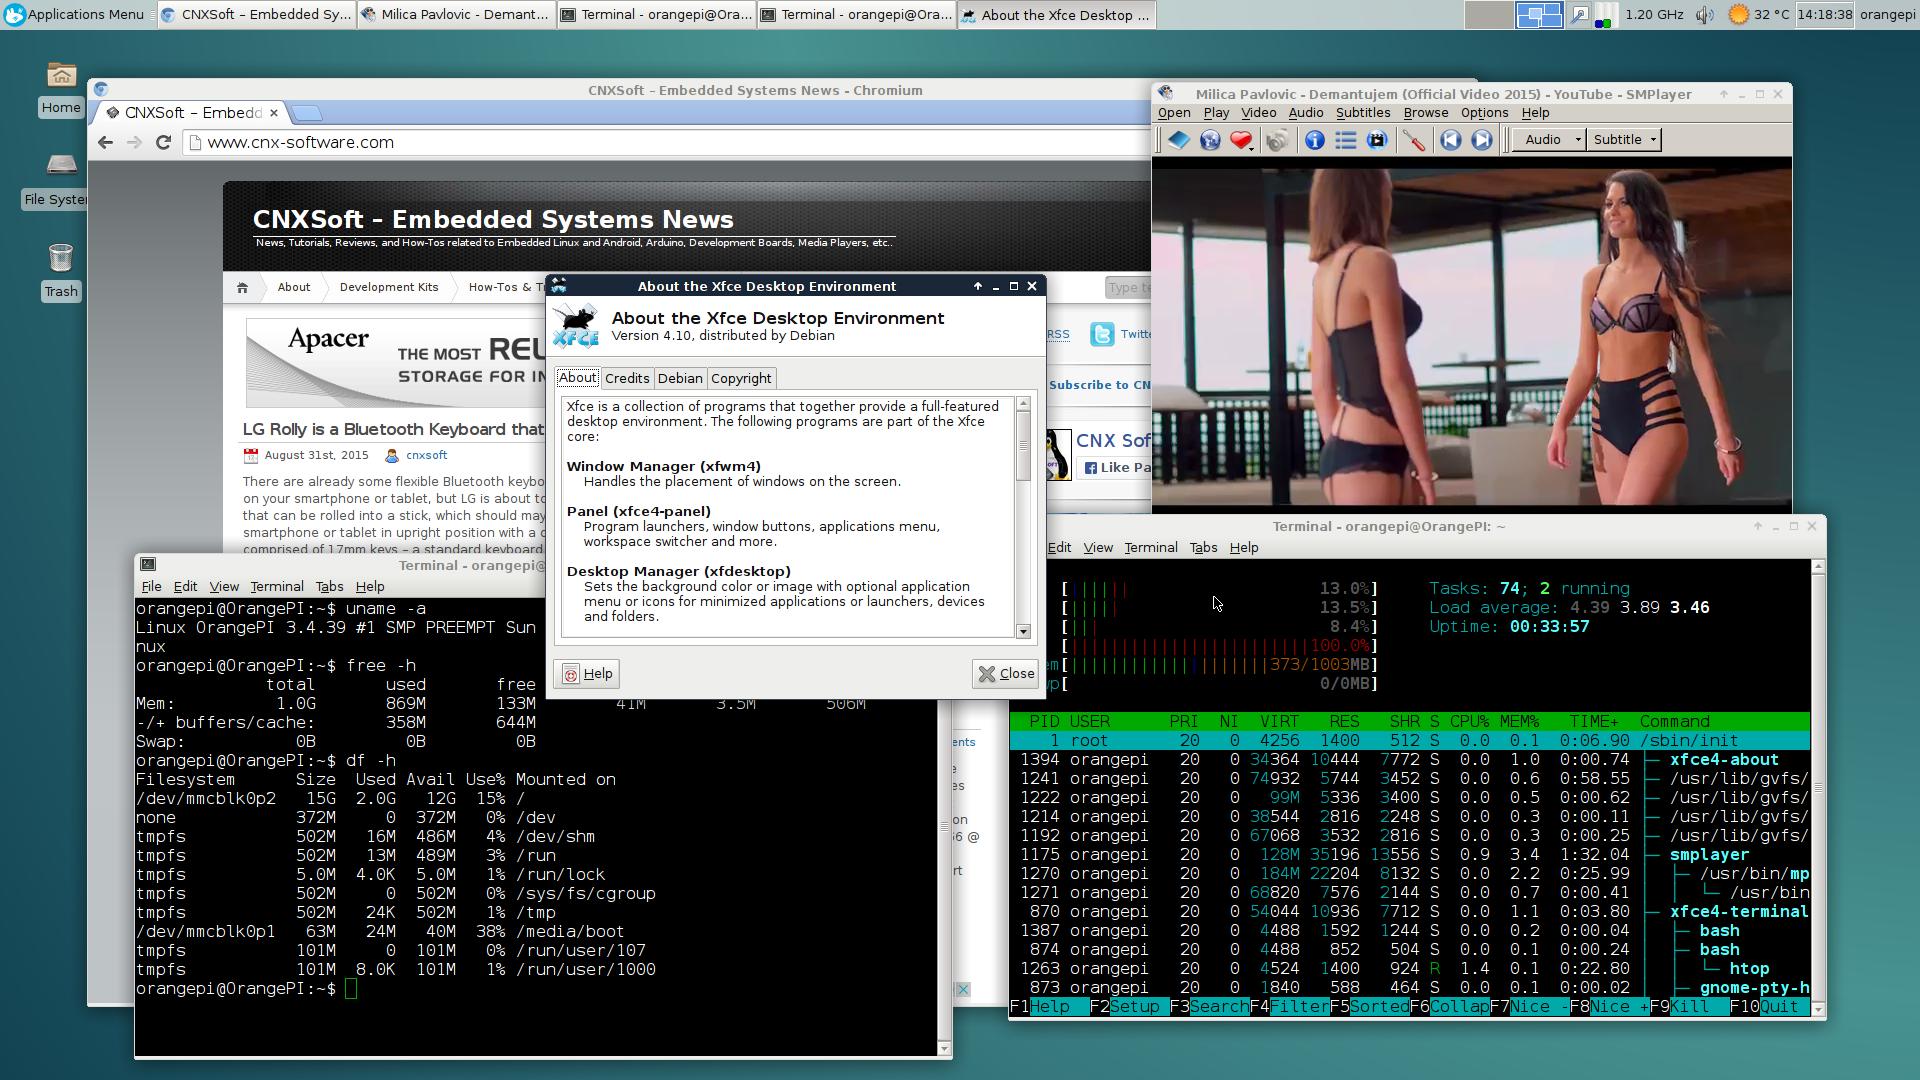 How To Add Repositories To Debian 8.1.0 | Unixmen